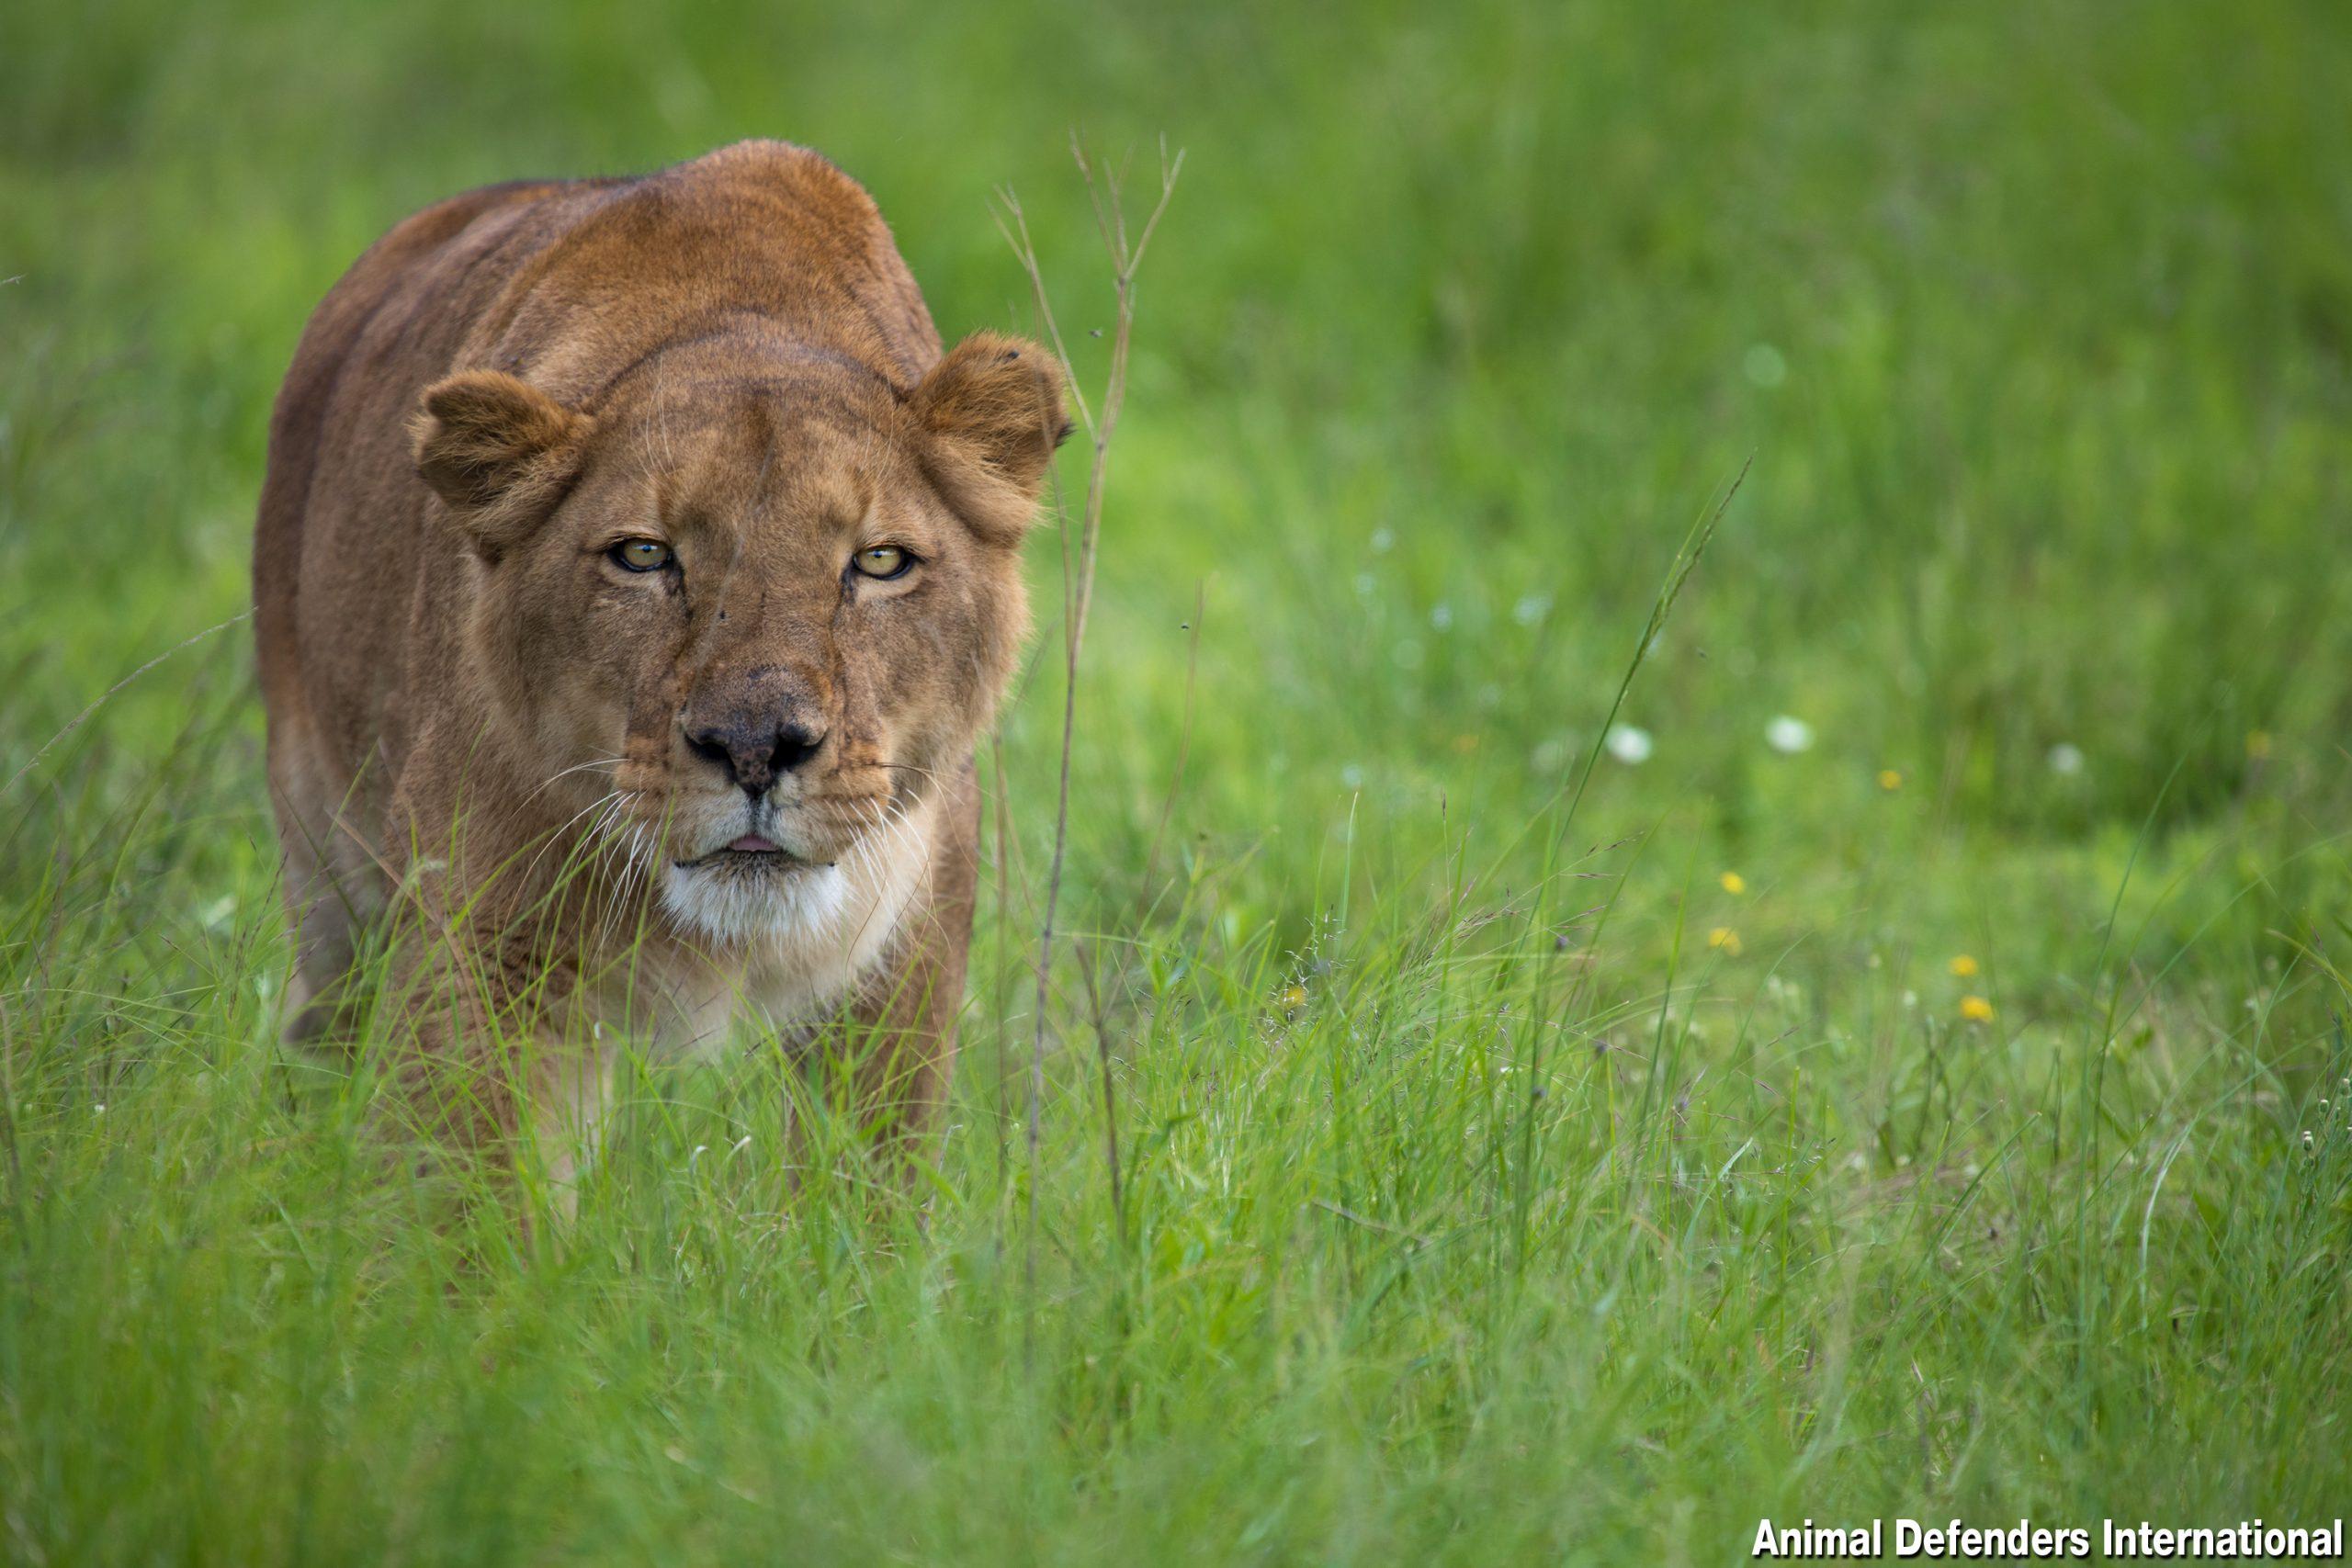 Tanya the lion at ADI Wildlife Sanctuary